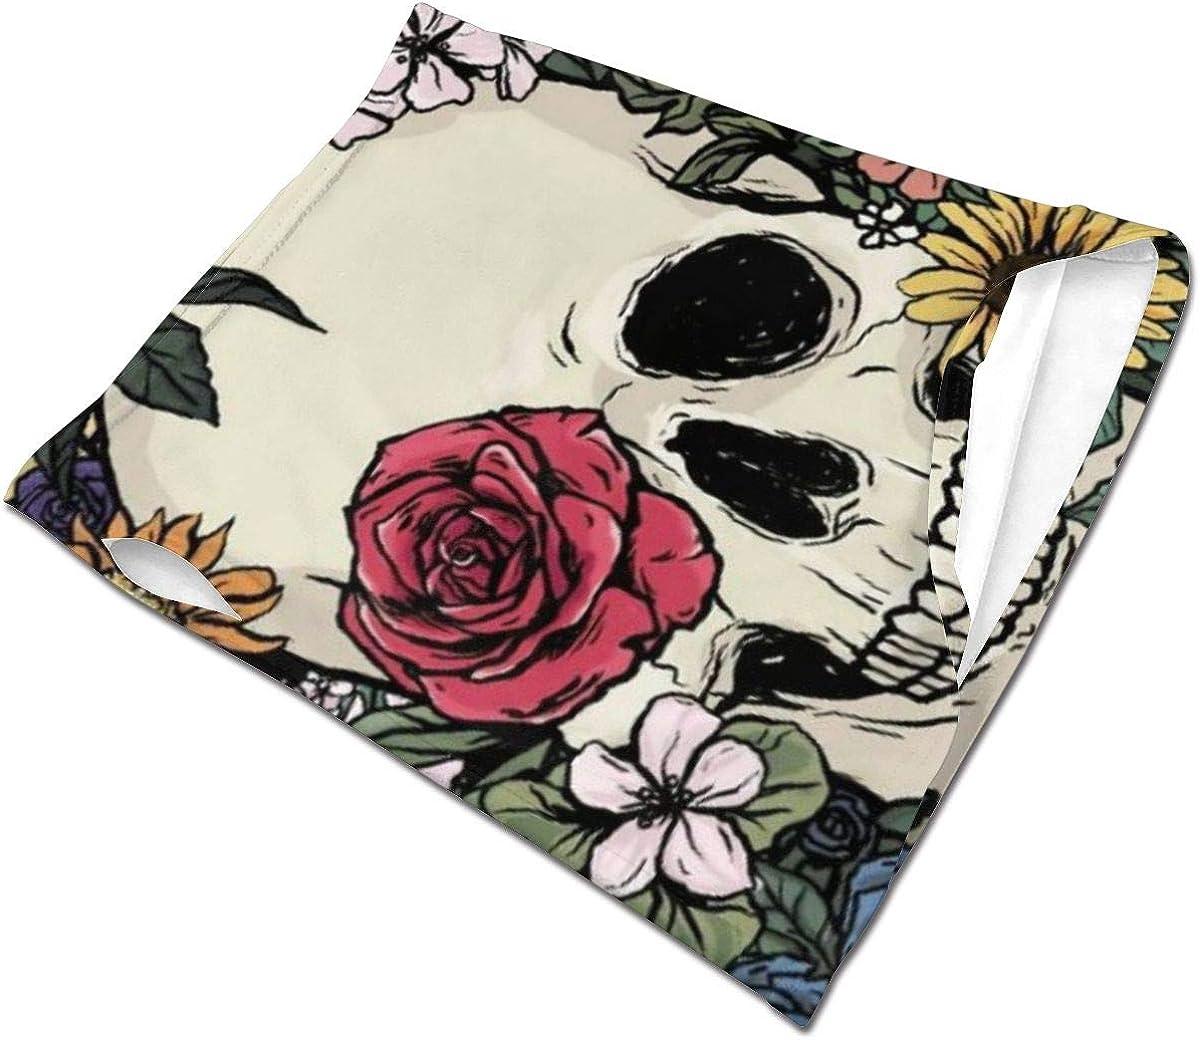 Sunflower Red Dance Skull Bone Skeleton Novelty Windbreak Face Mask Scarf Bandana Ear Loops Face Balaclava Neck Gaiters